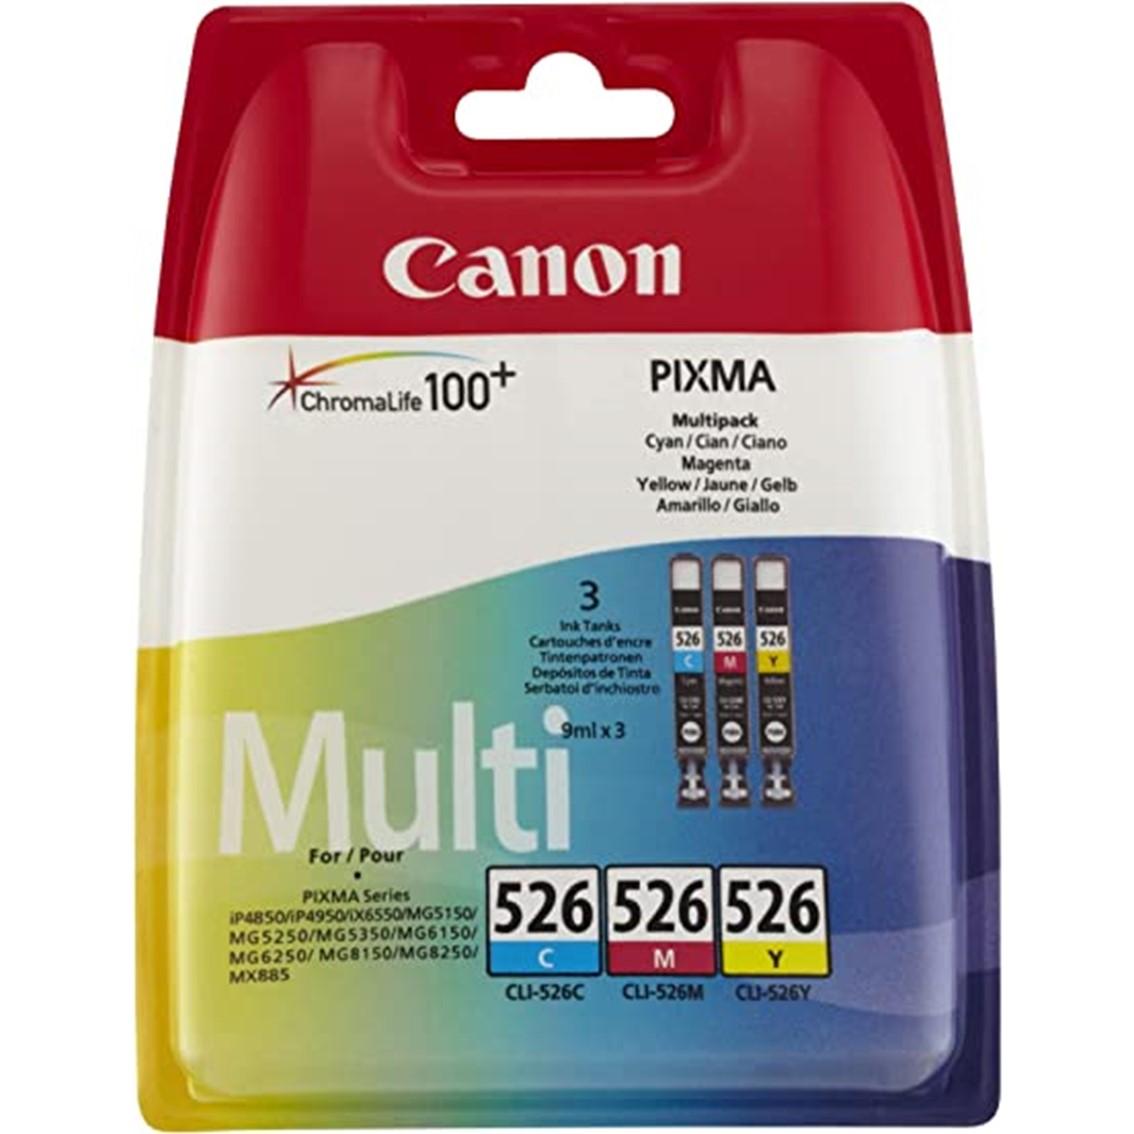 MULTIPACK CANON CLI-526 MG5150 MG5250 MG6150